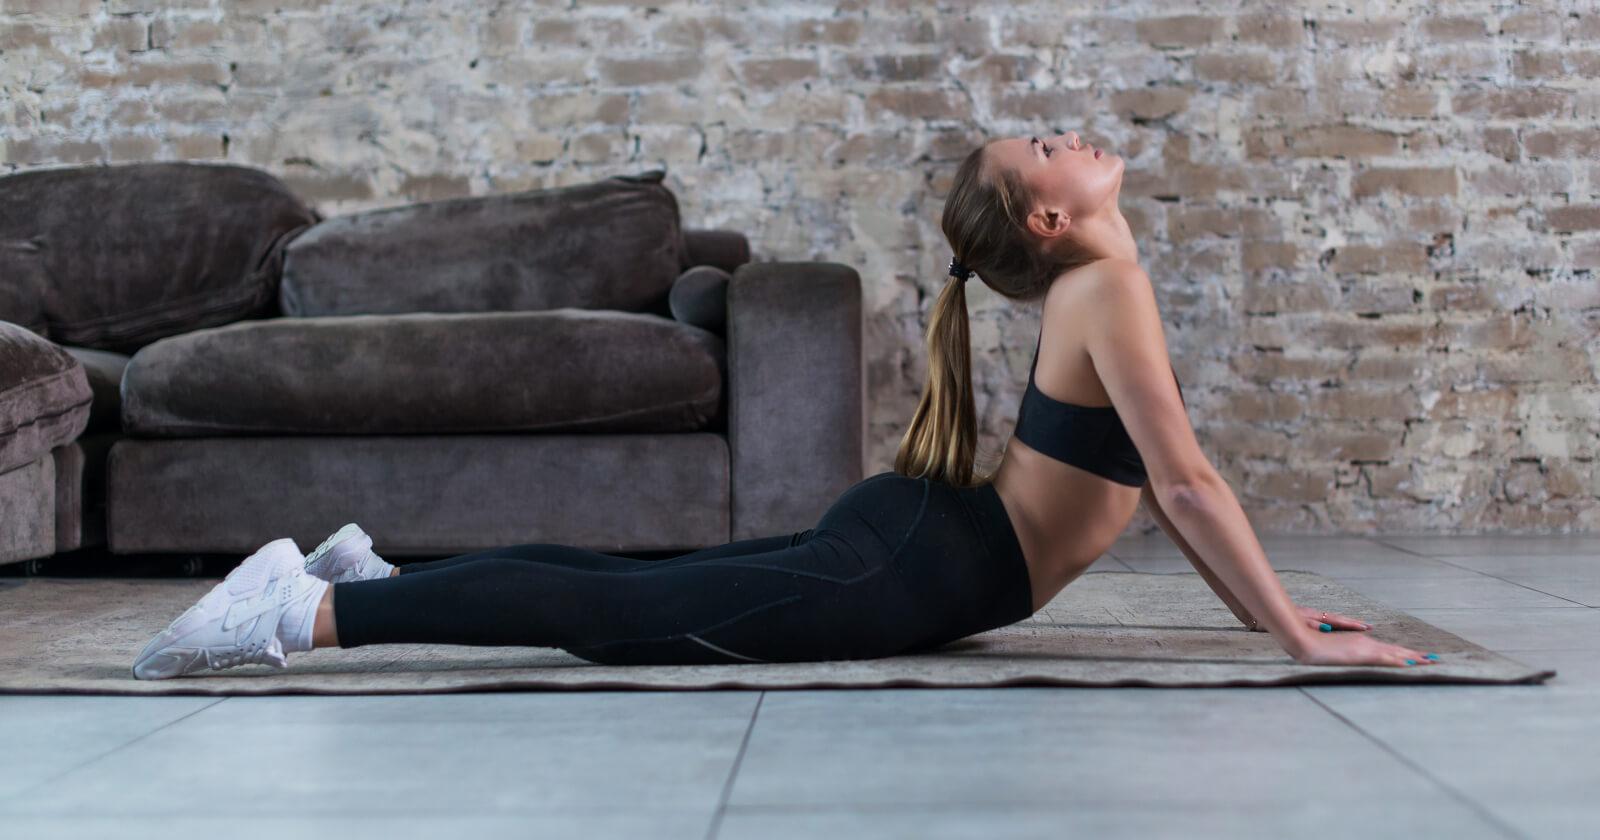 Frau macht die Yoga-Übung Kobra aus der Reihe der Asana Fibel.